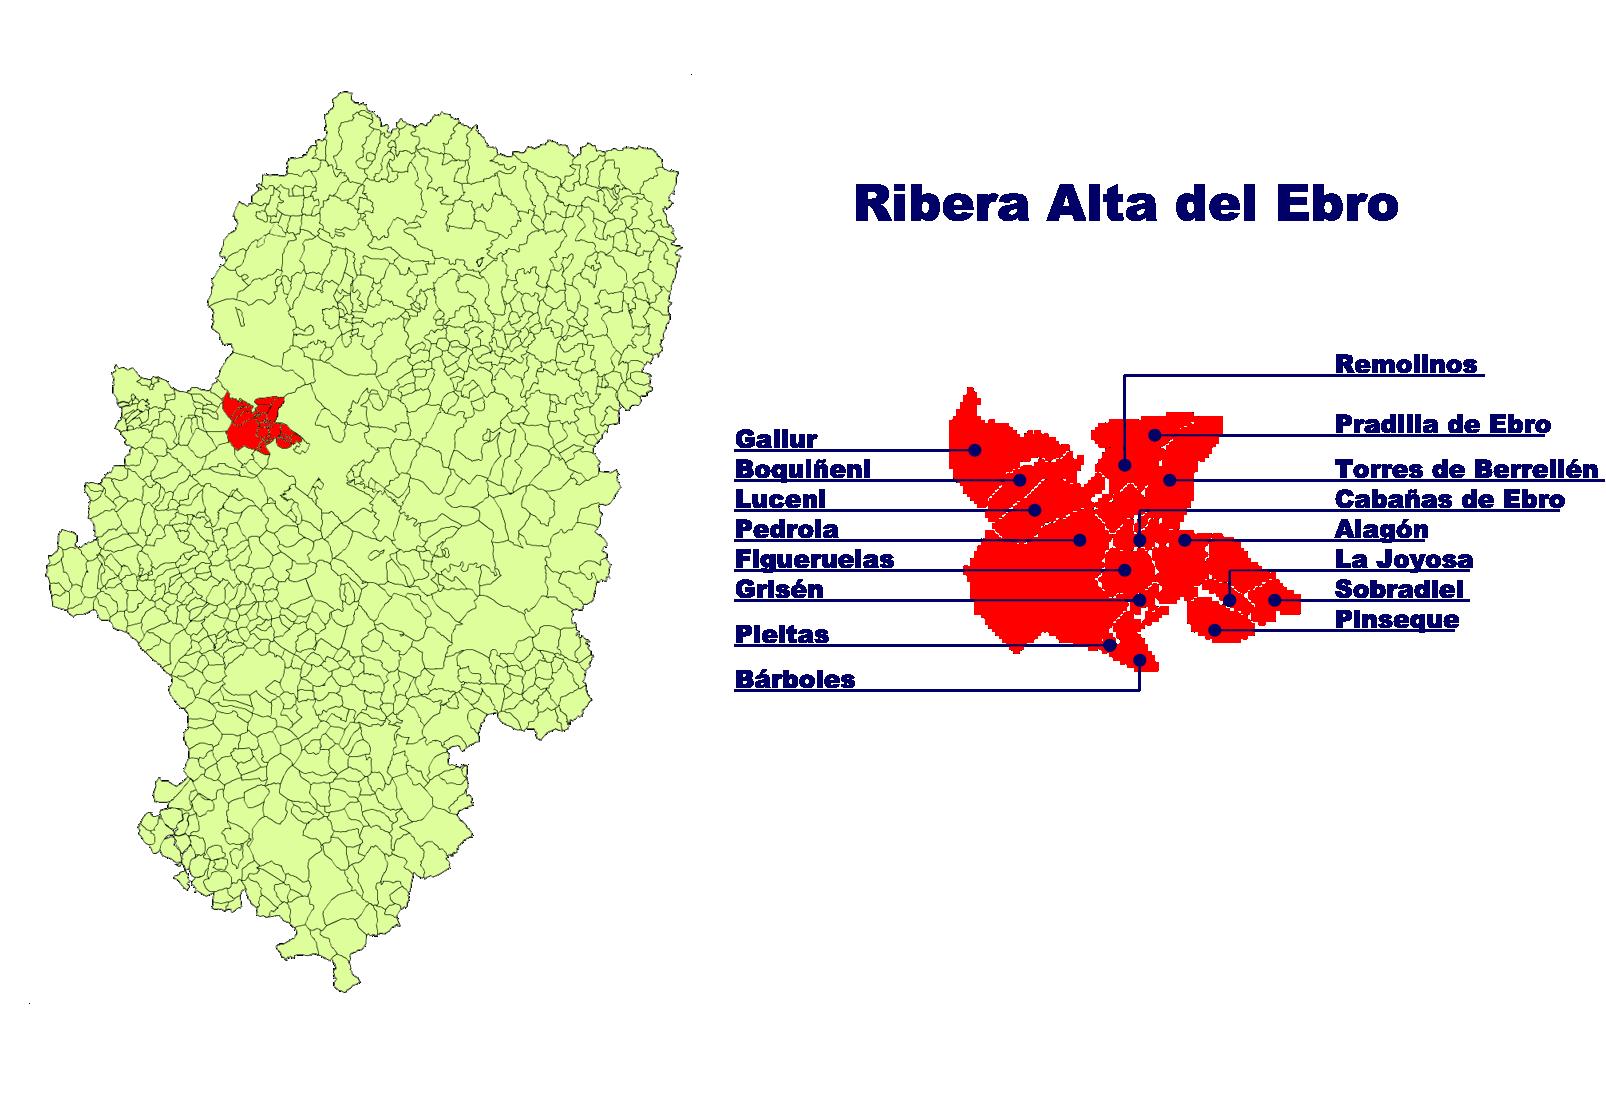 Depiction of Ribera Alta del Ebro